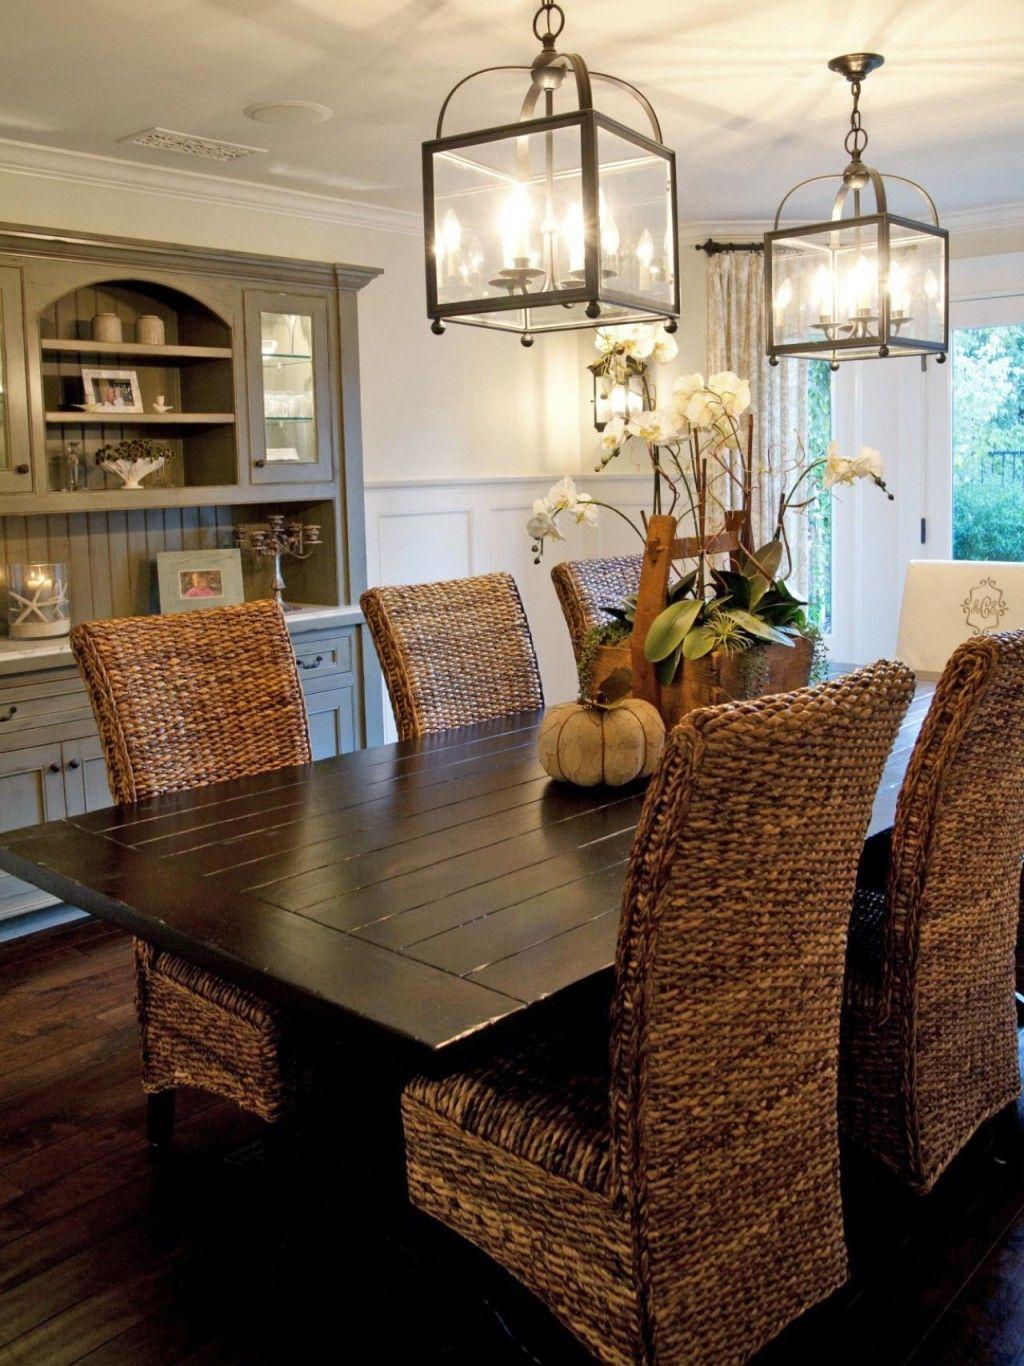 Hanging Dining Room Light Fixtures  Google Search  Home Magnificent Hanging Dining Room Lights Review